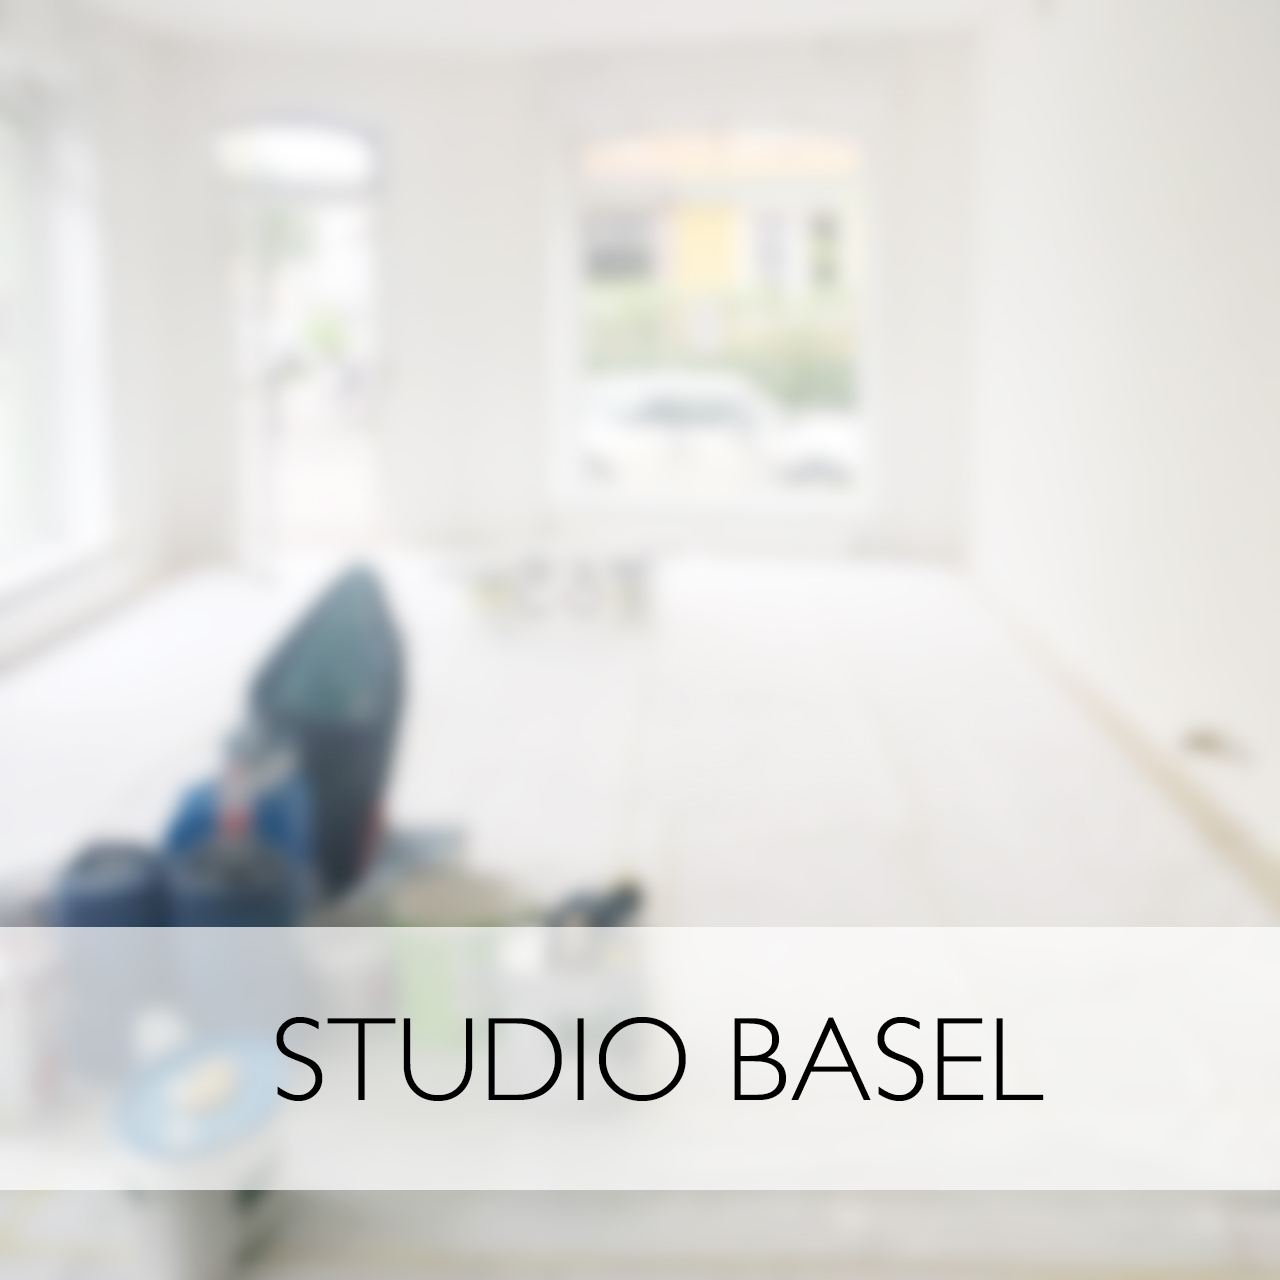 Studiobasel